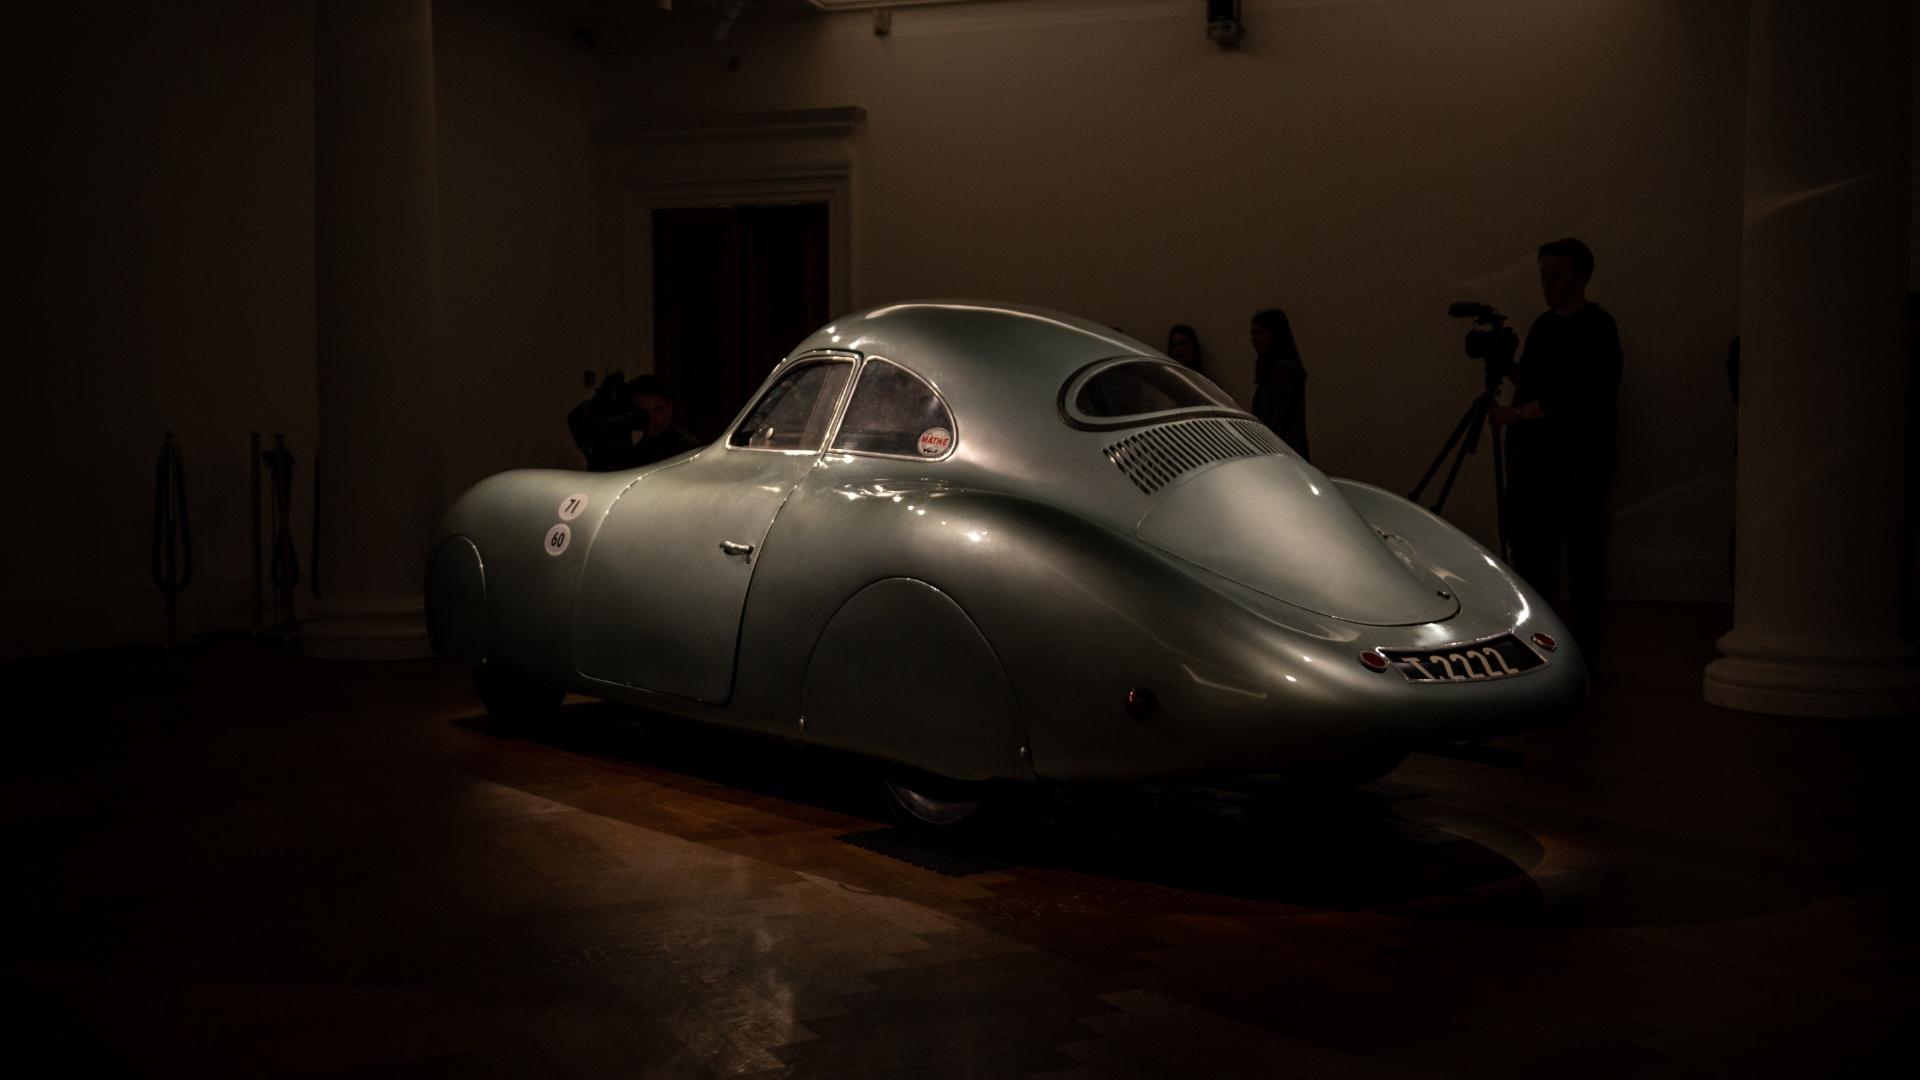 Porsche Type 64 chassis three